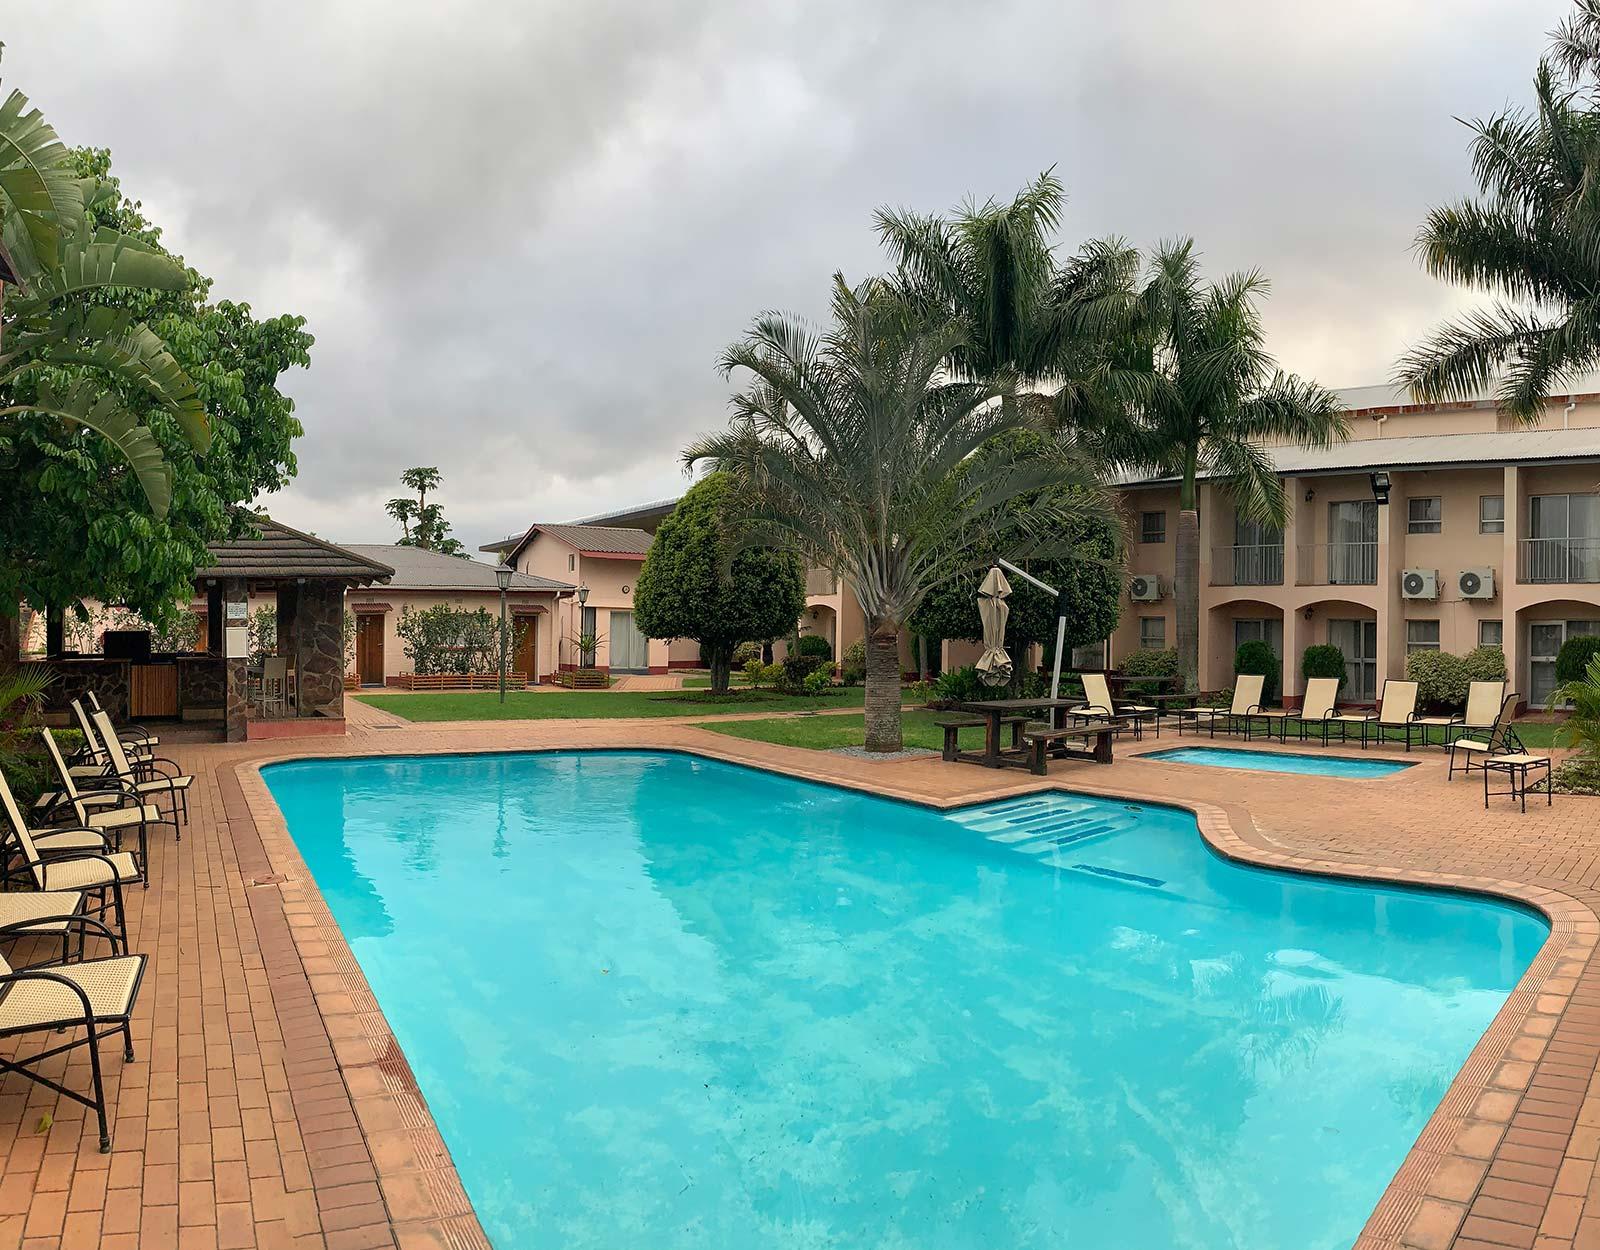 Swimming pool in Manzini, Eswatini. The £4 bus that cost me £700